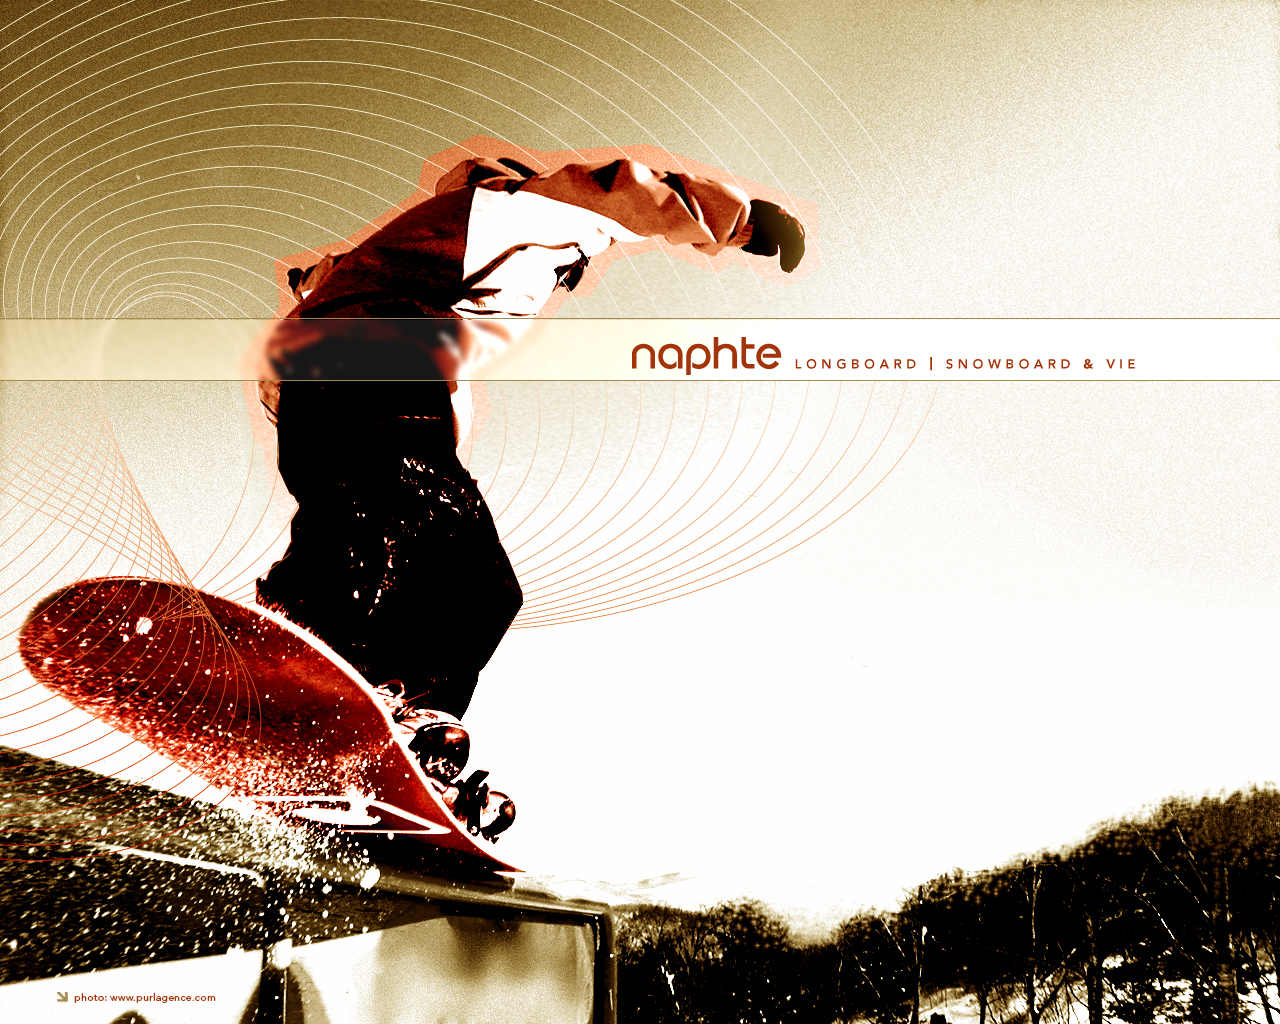 Snowboarding Wallpaper on Snowboarding Snowboard Hd Wallpaper   General   277258